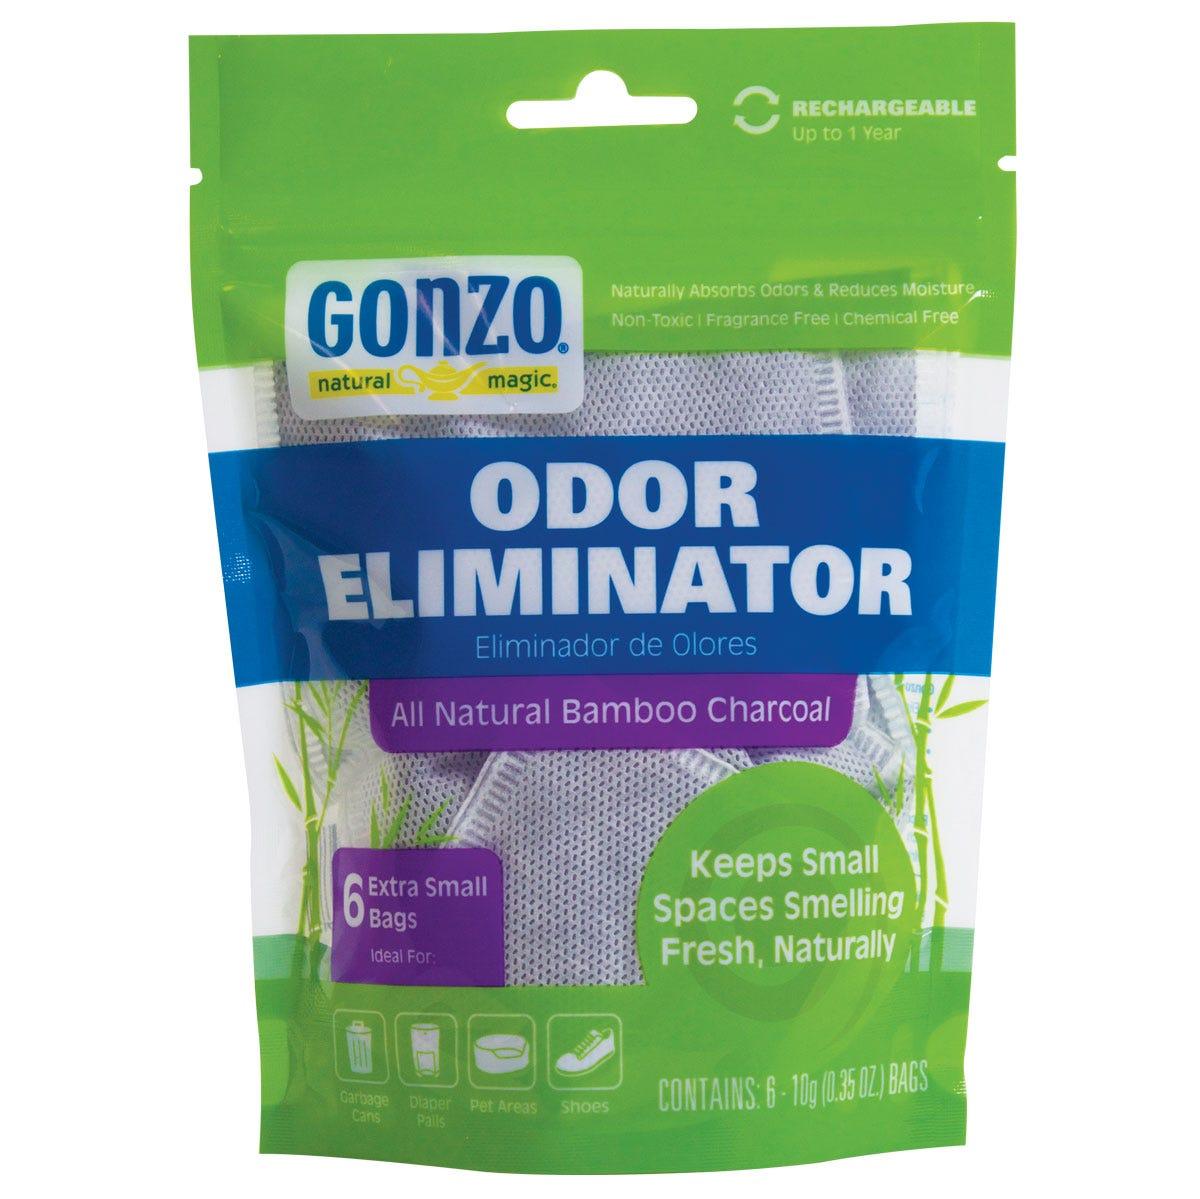 https://googone.com/media/catalog/product/s/h/shoe-odor-eliminator_front.jpg